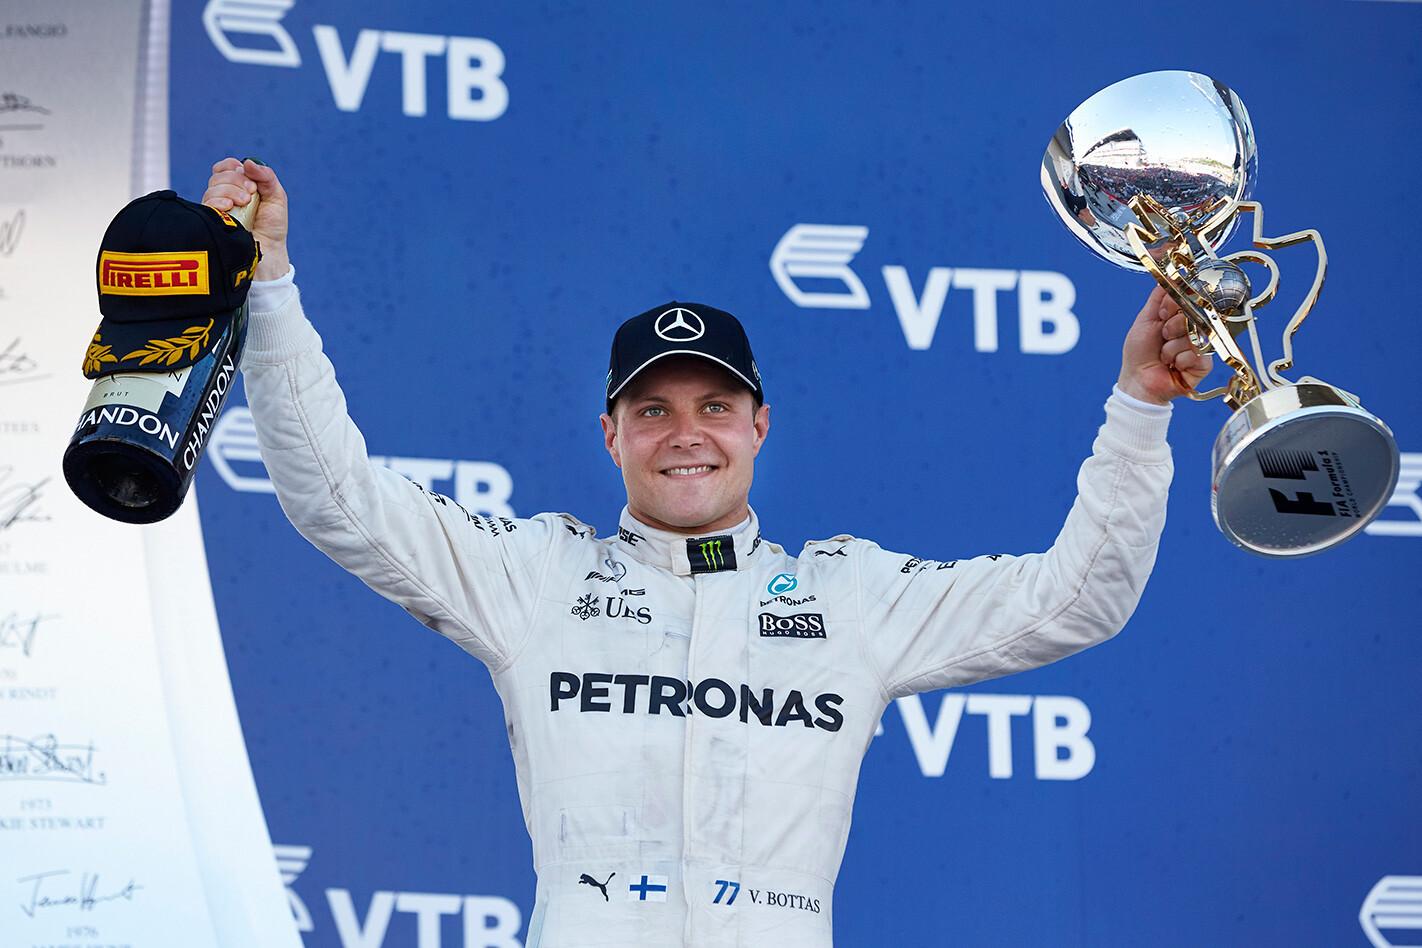 Bottas wins 2017 F1 Russian Grand Prix